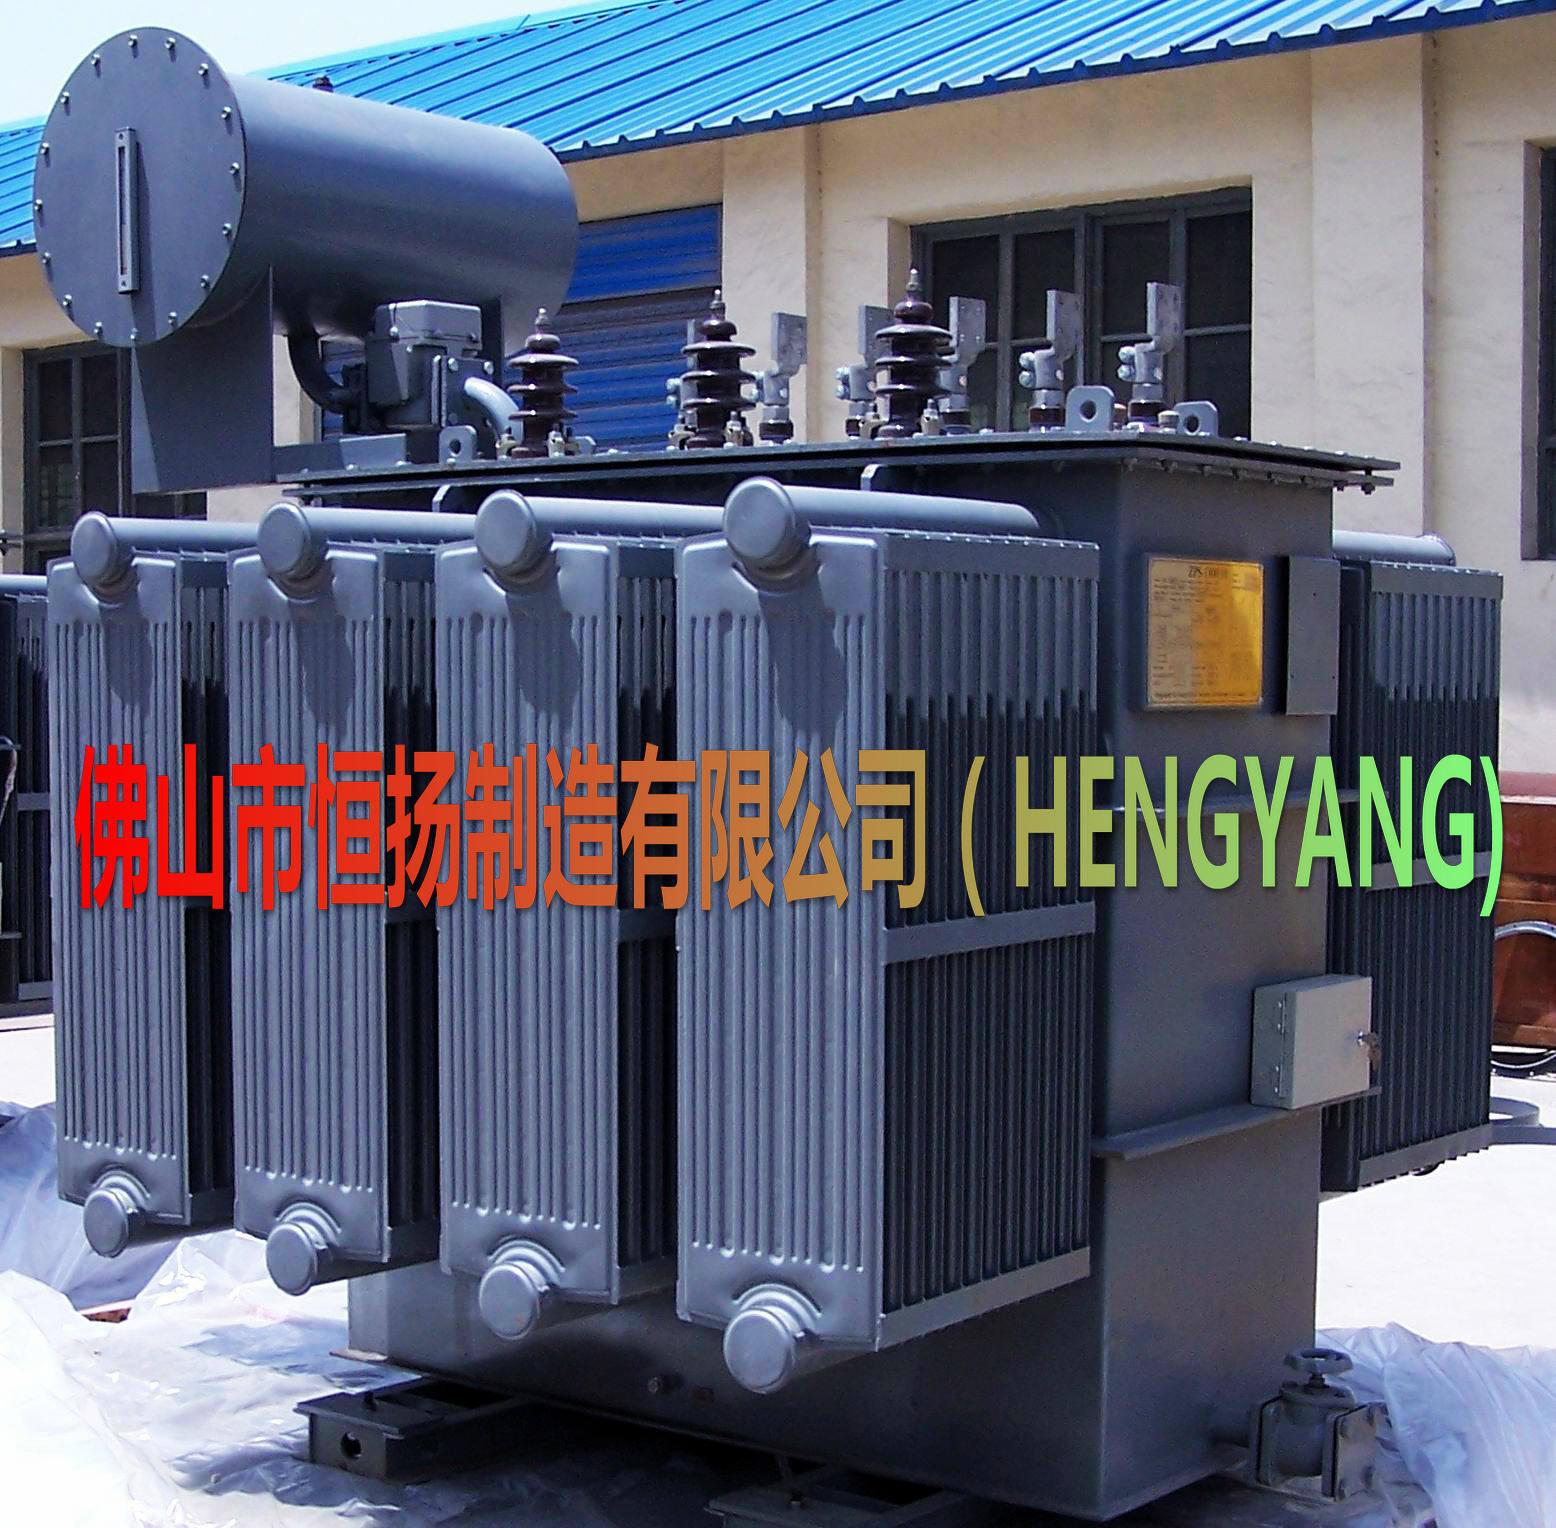 [Hot Item] Intermediate Frequency Furnace Special Transformer